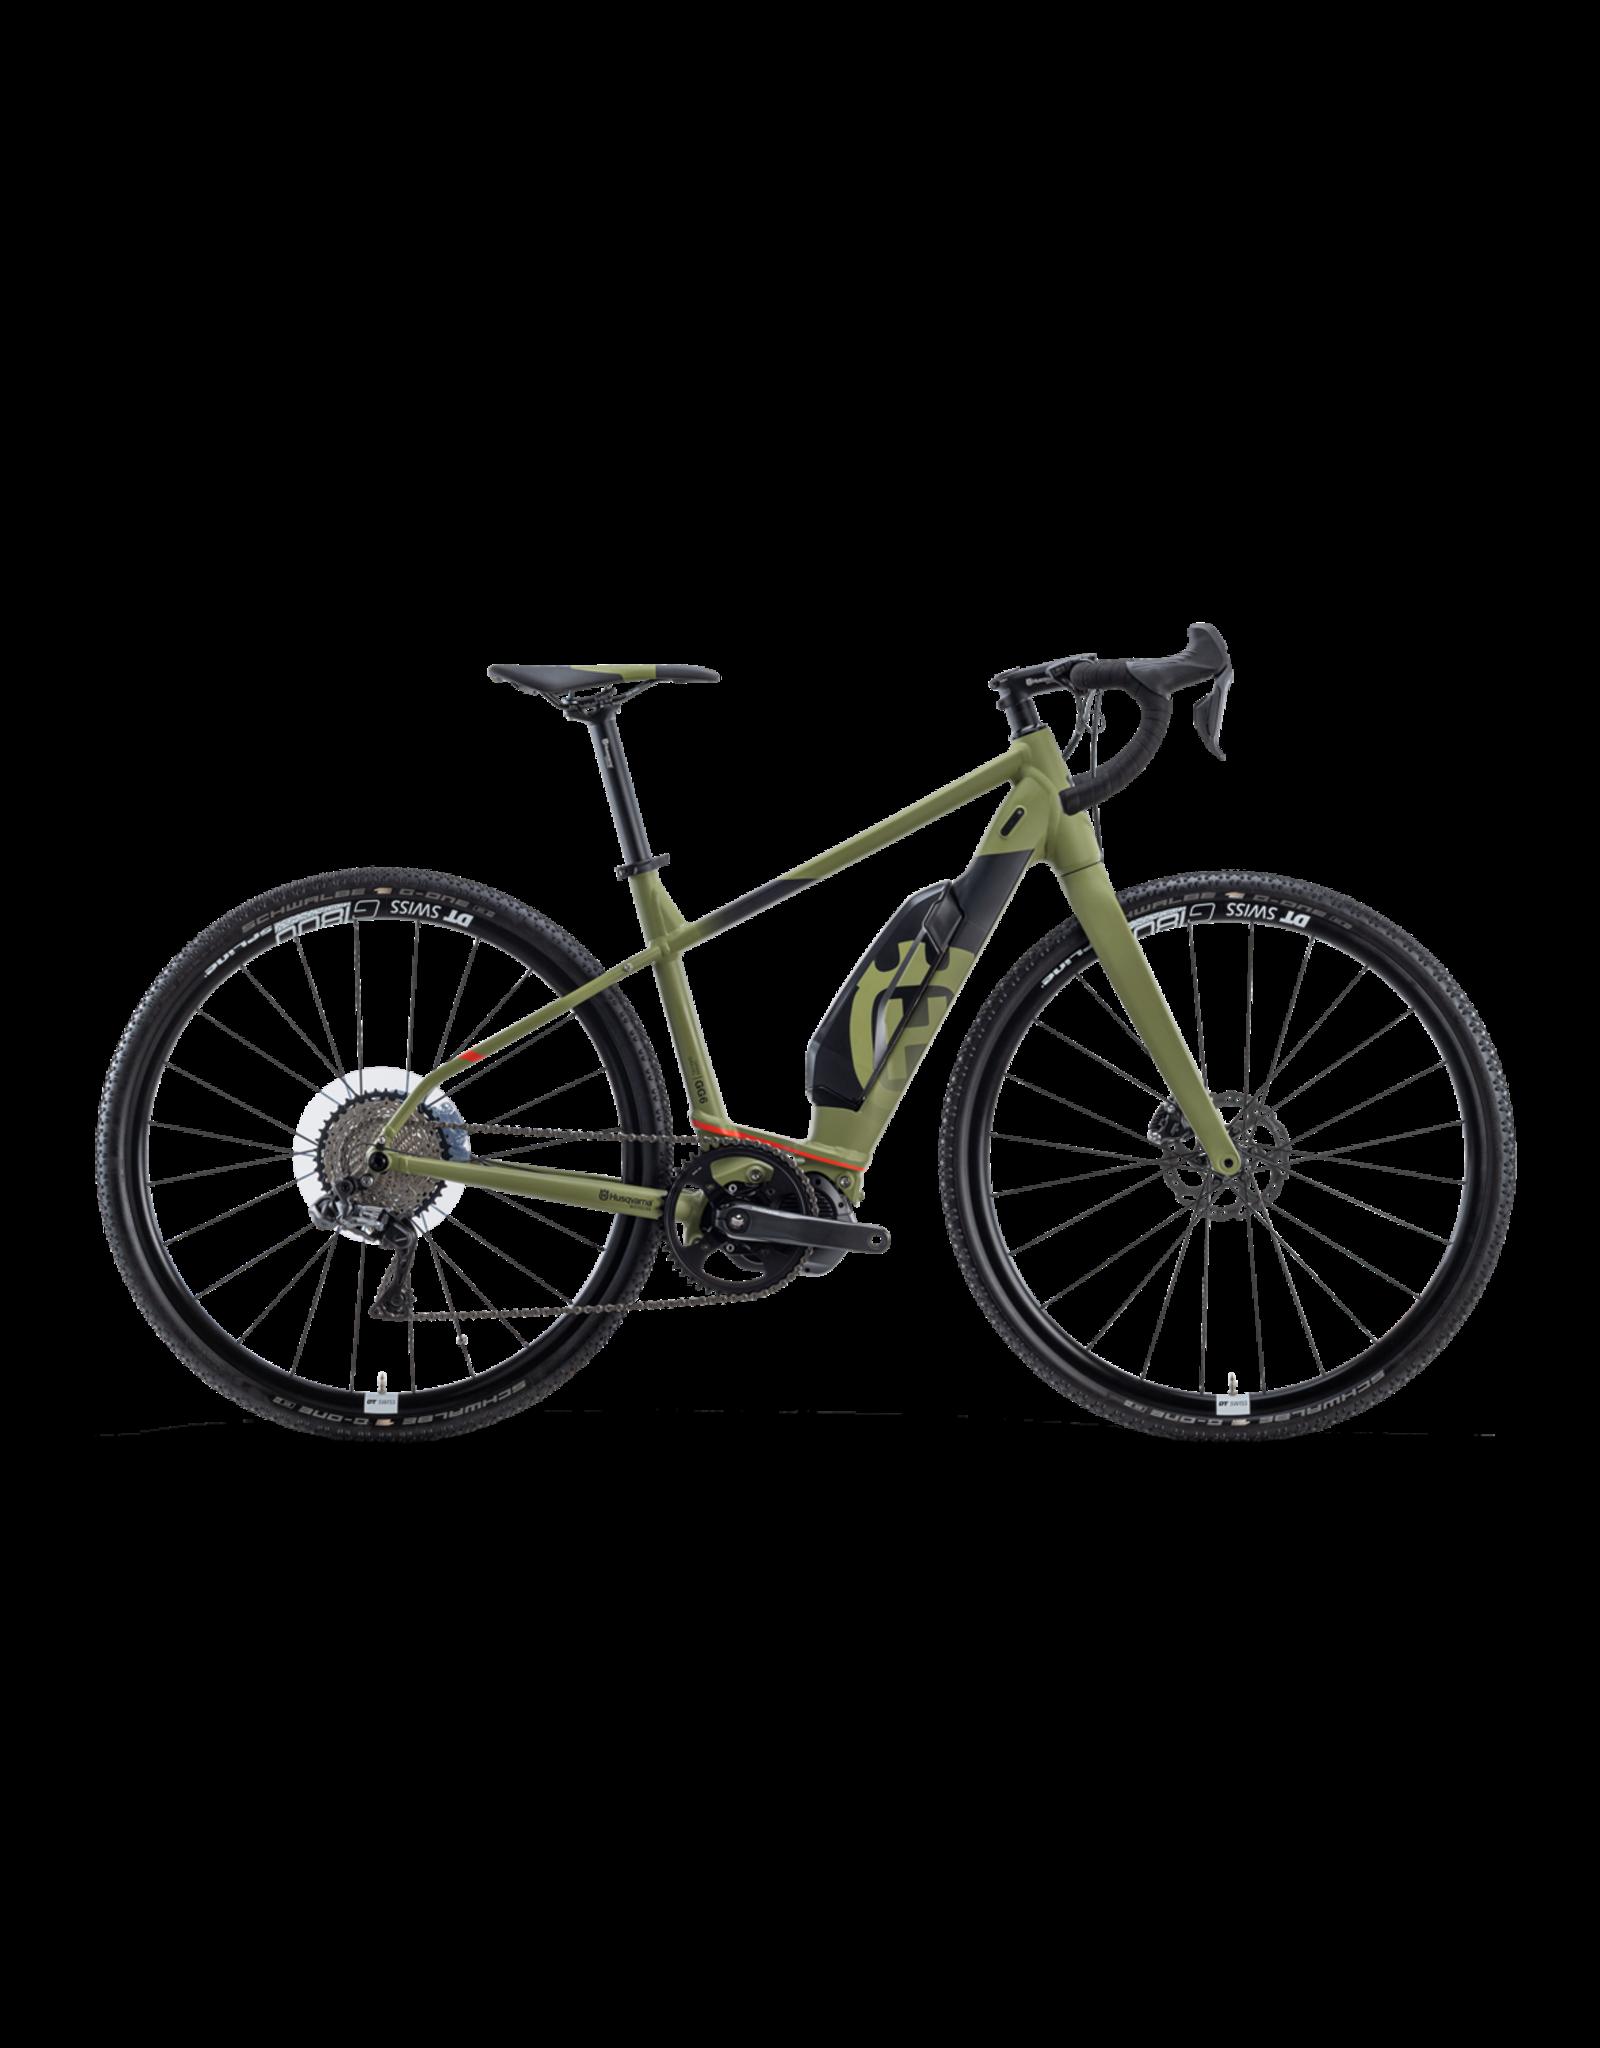 HUSQVARNA Bicycles Husqvarna Bicycles - Gran Gravel GG6 - 20/21